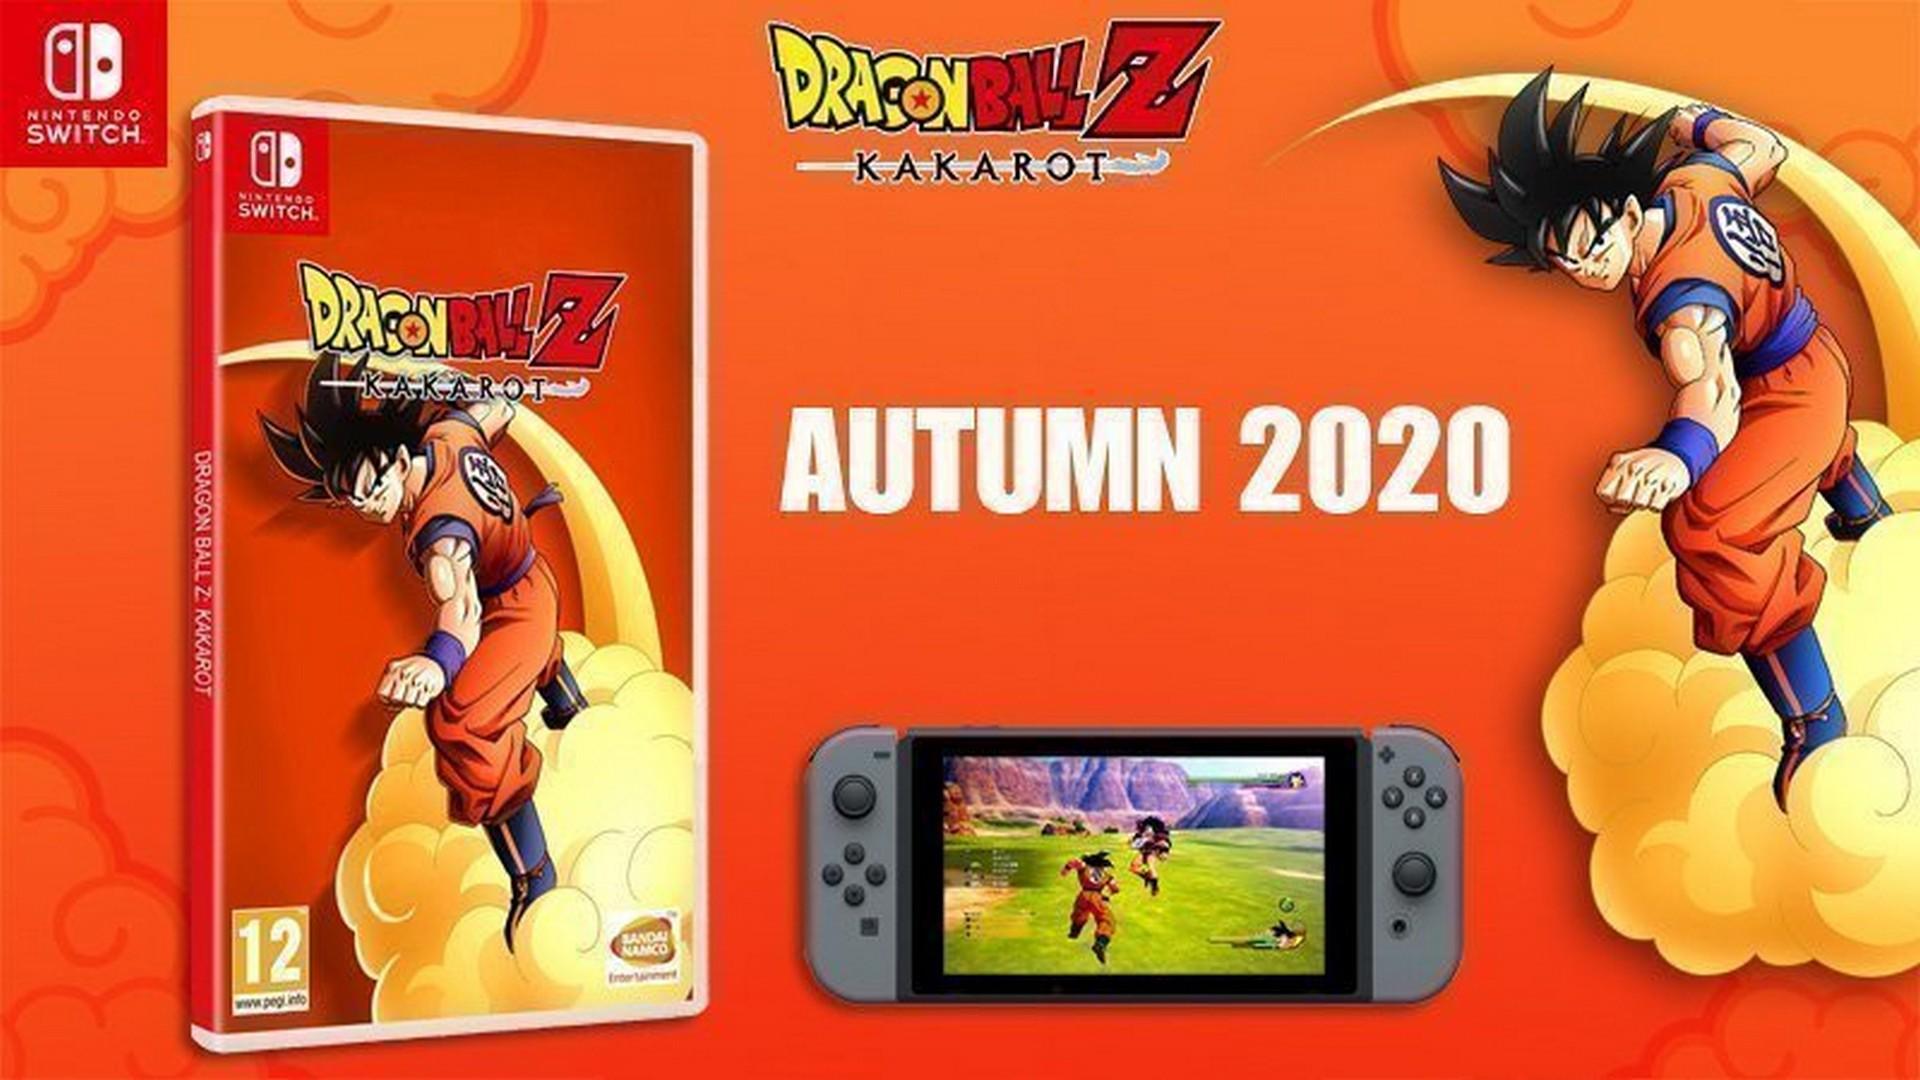 DRAGON BALL Z: KAKAROT arriva a settembre su NINTENDO Switch